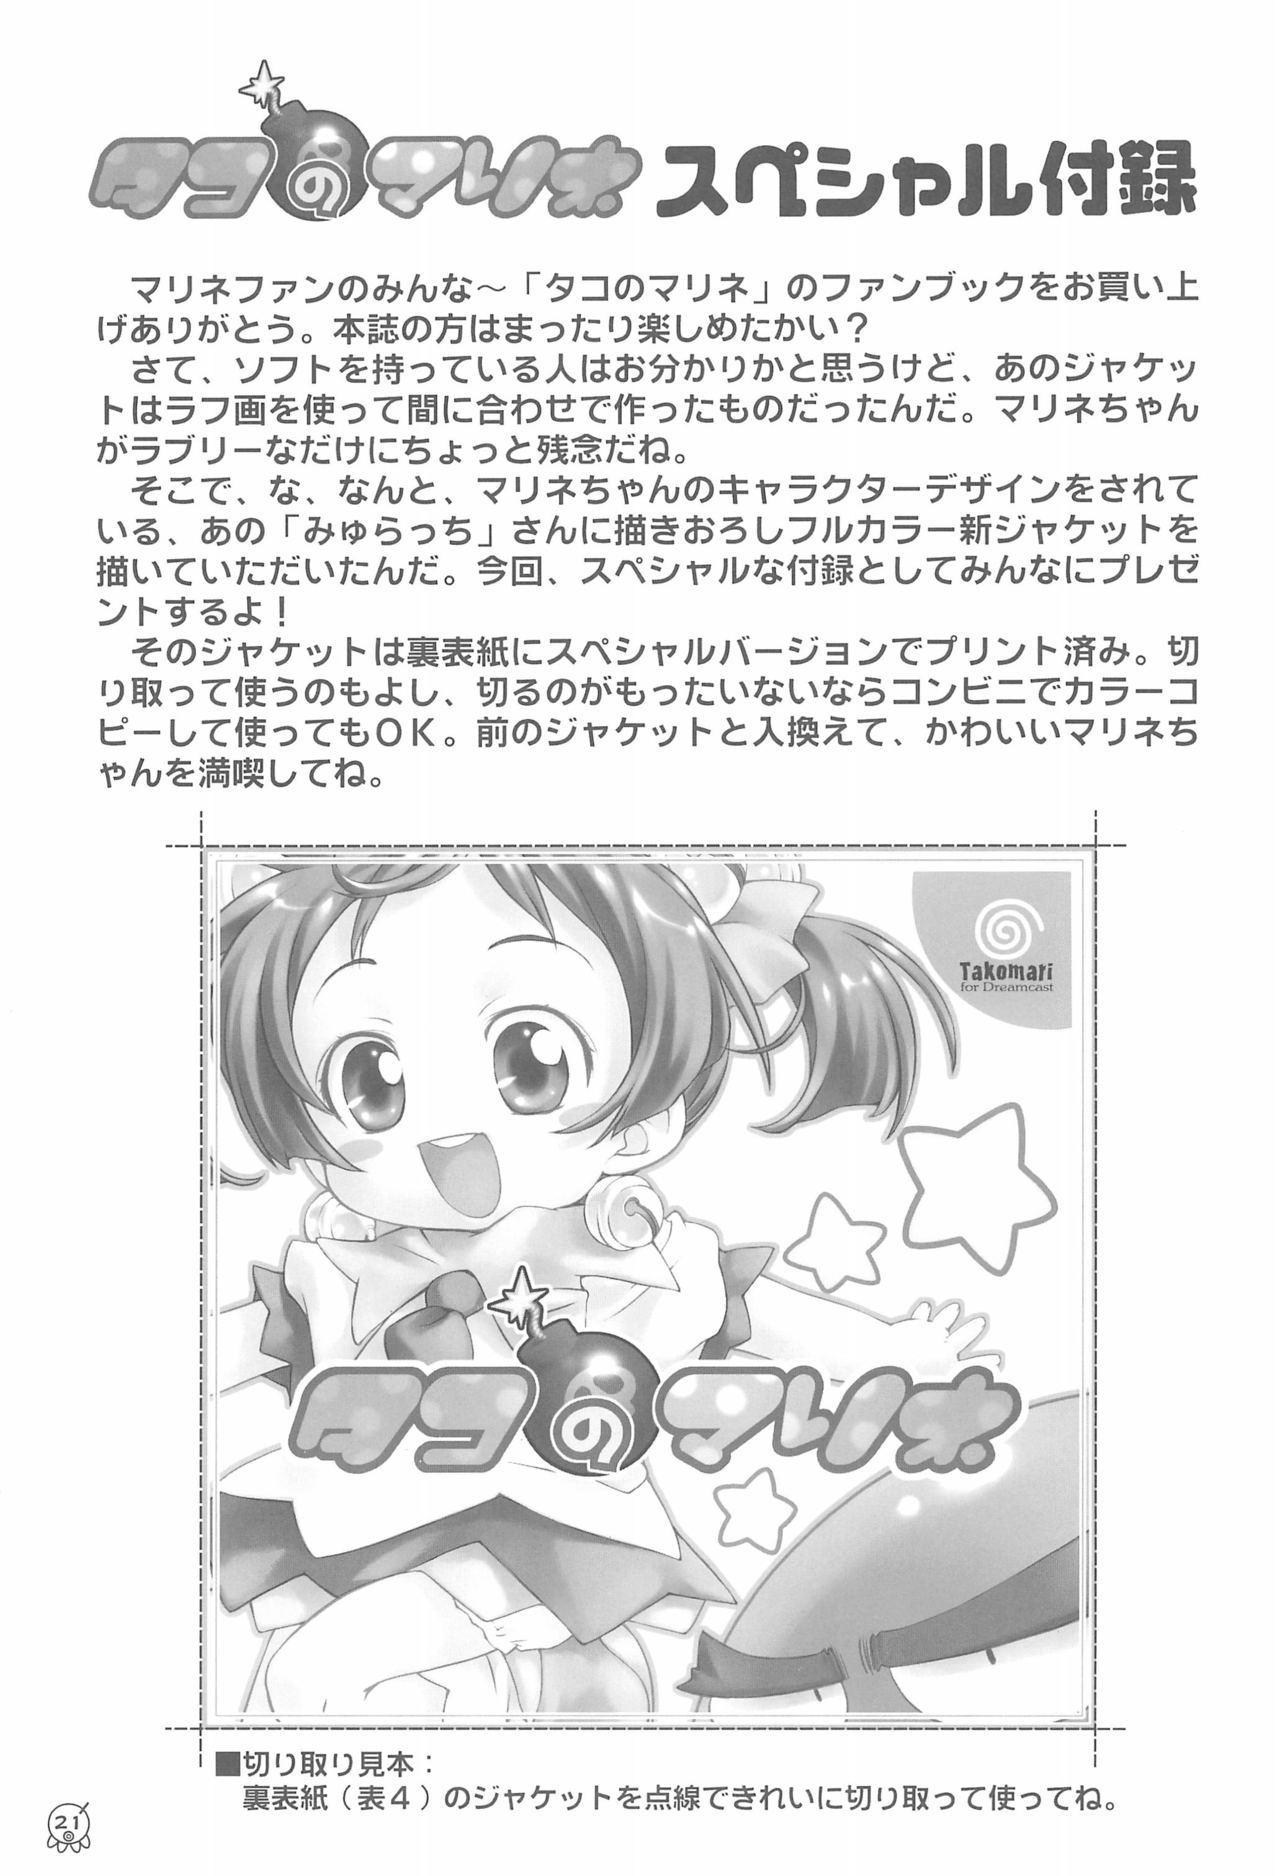 TakoMari BOOK 22